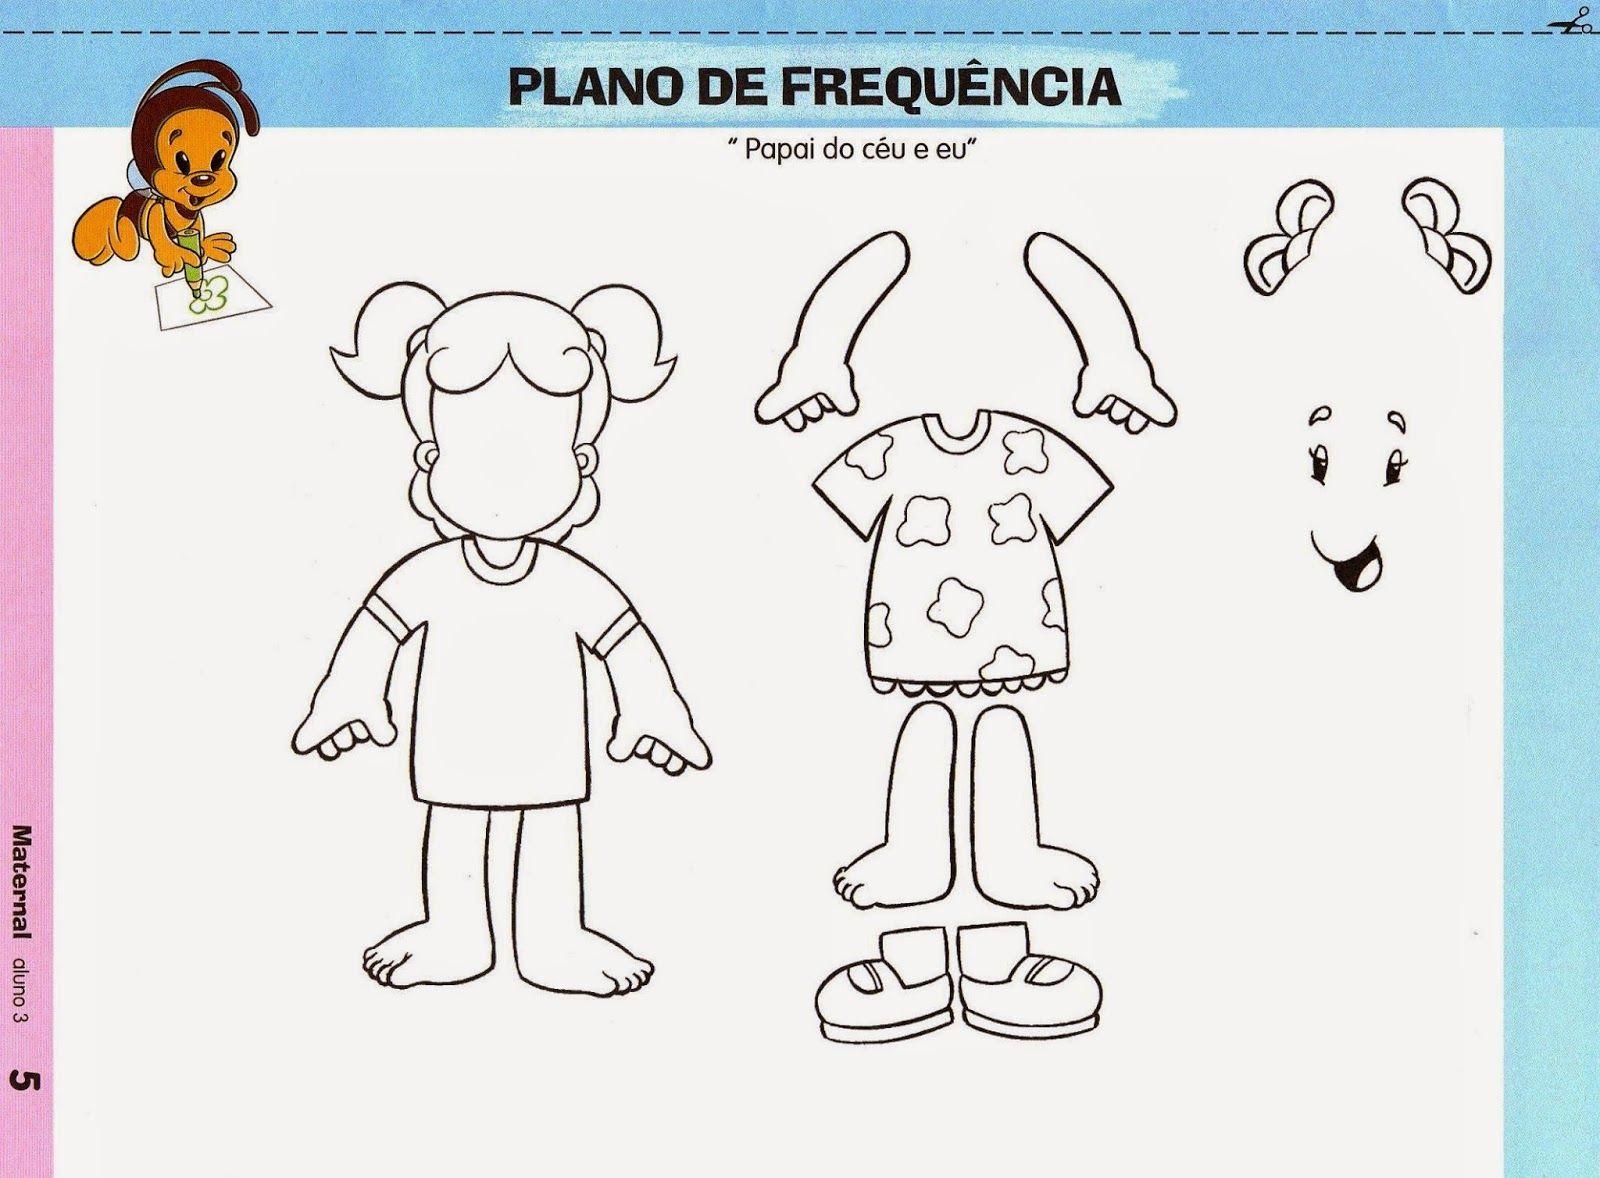 Extremamente Escola Dominical Infantil: Plano de frequencia - Editora CPAD  LR34